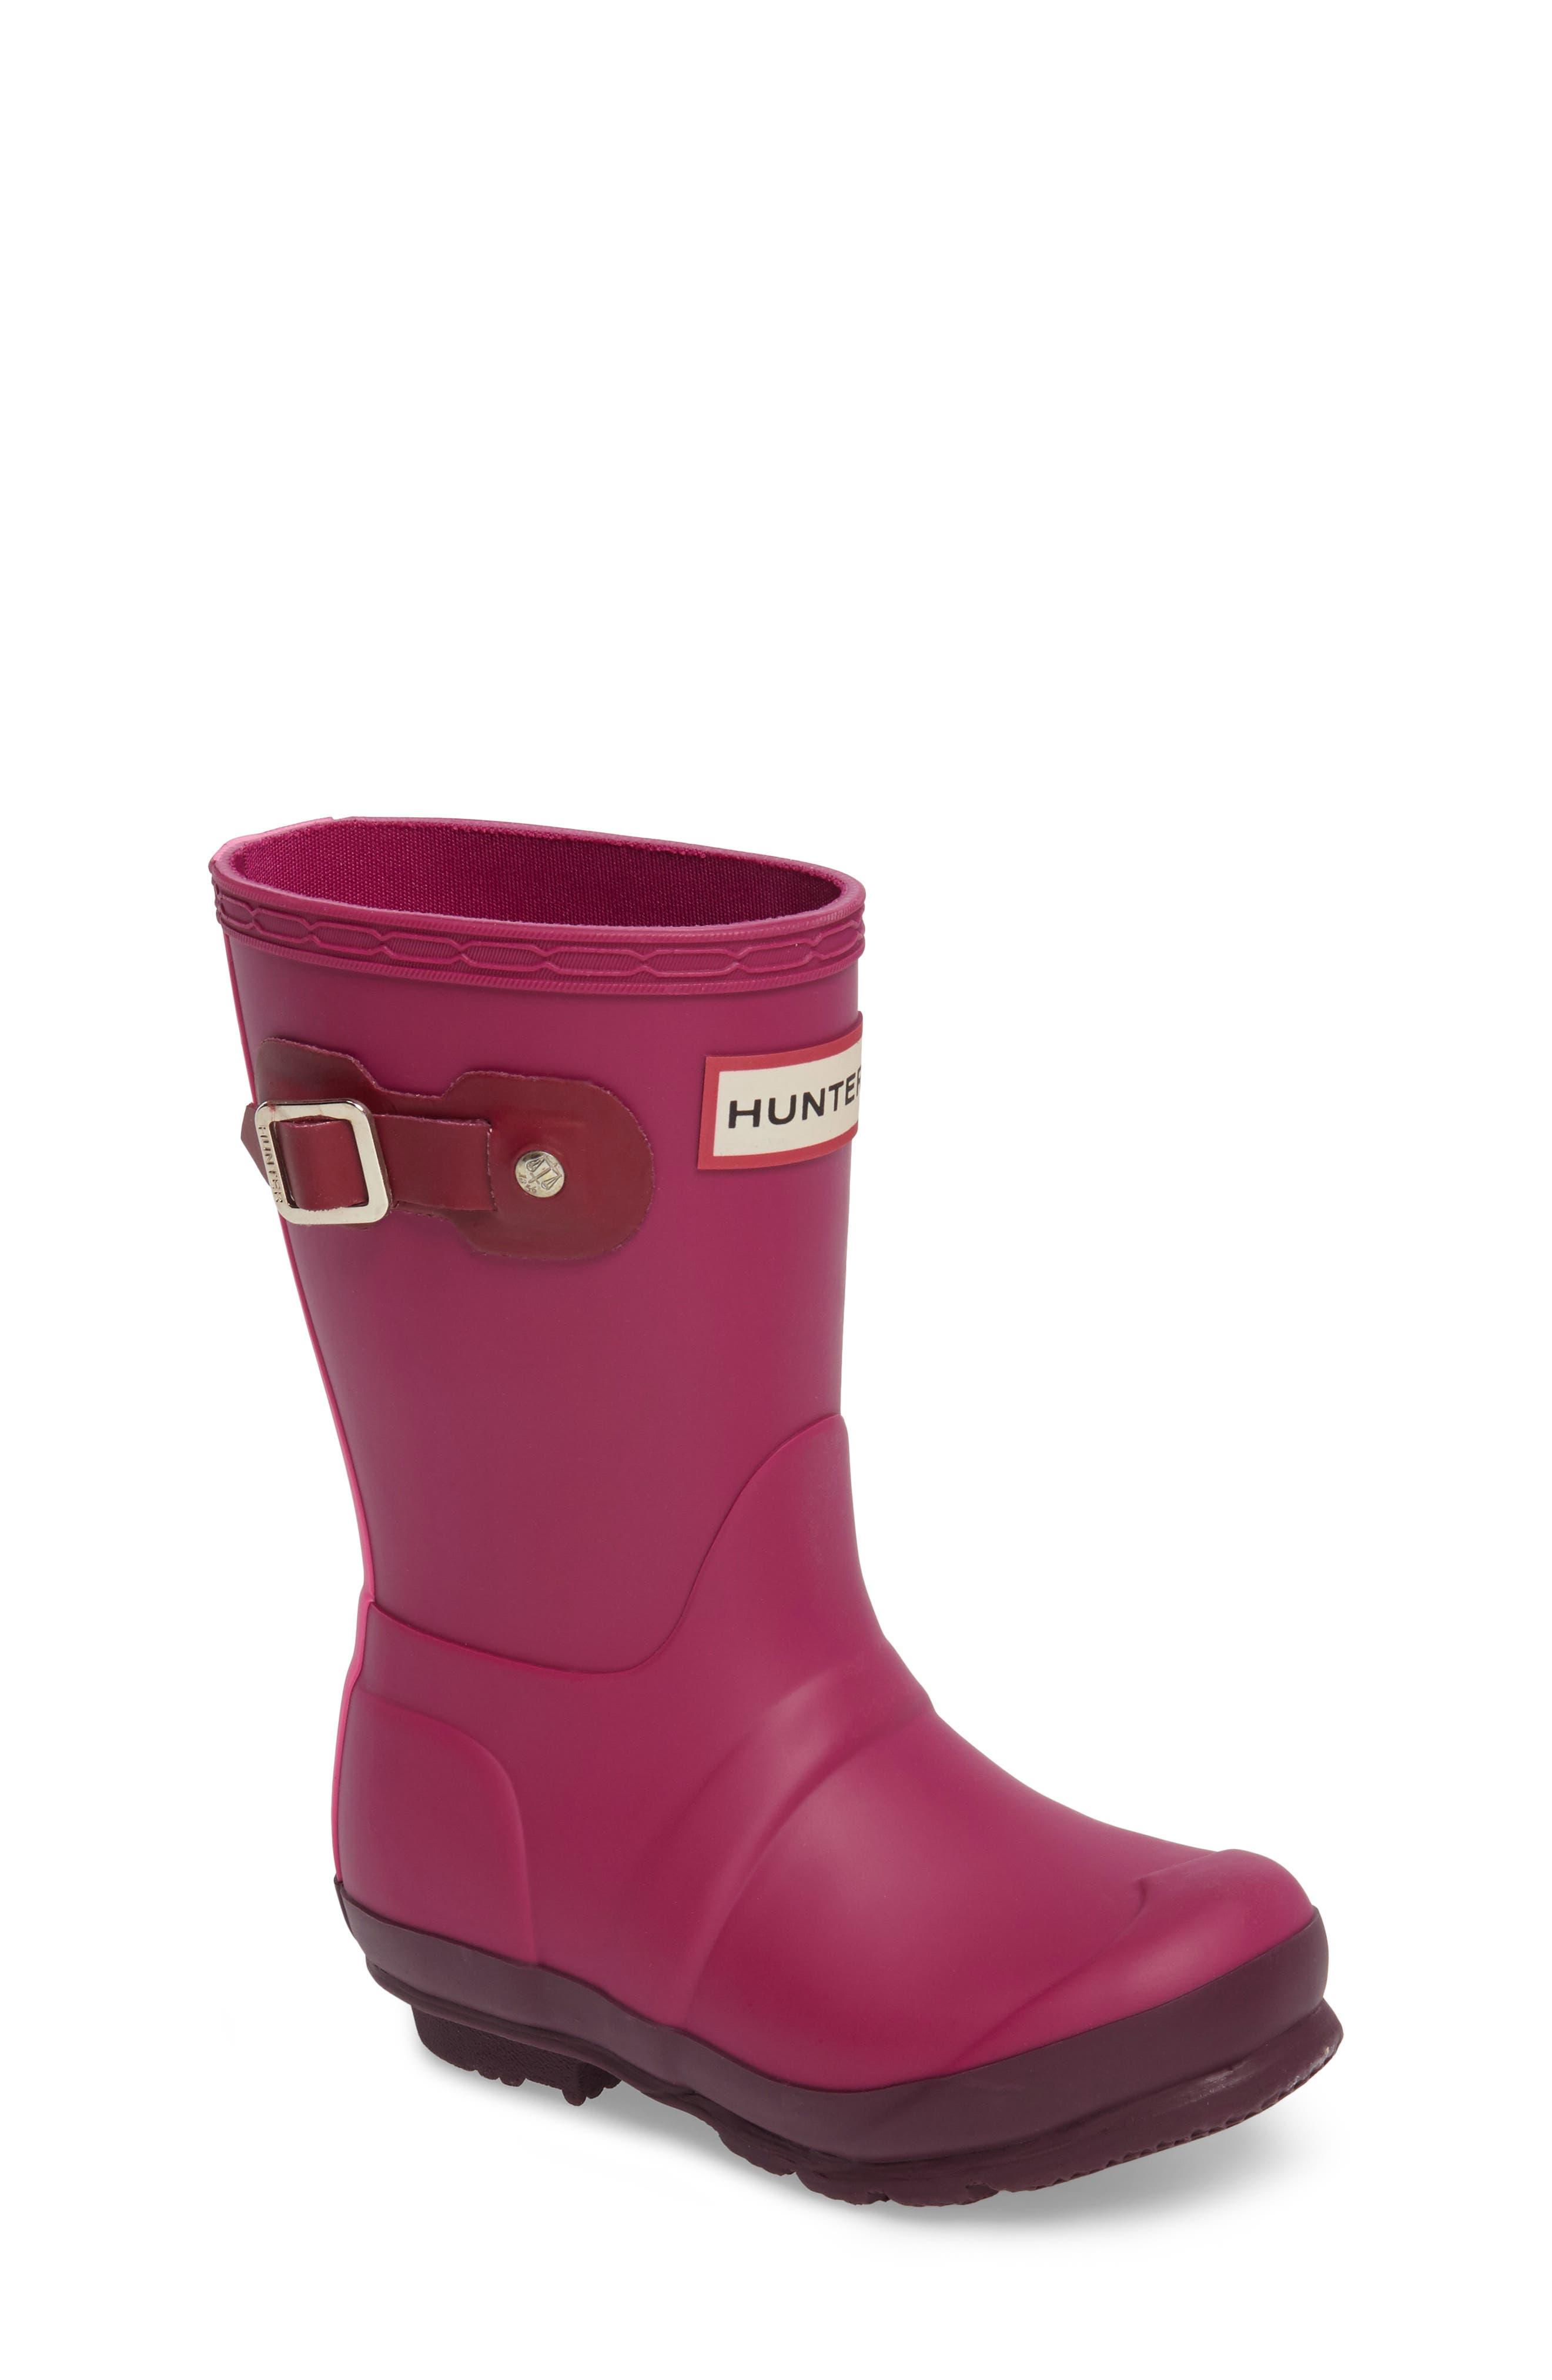 HUNTER Original Contrast Sole Waterproof Rain Boot